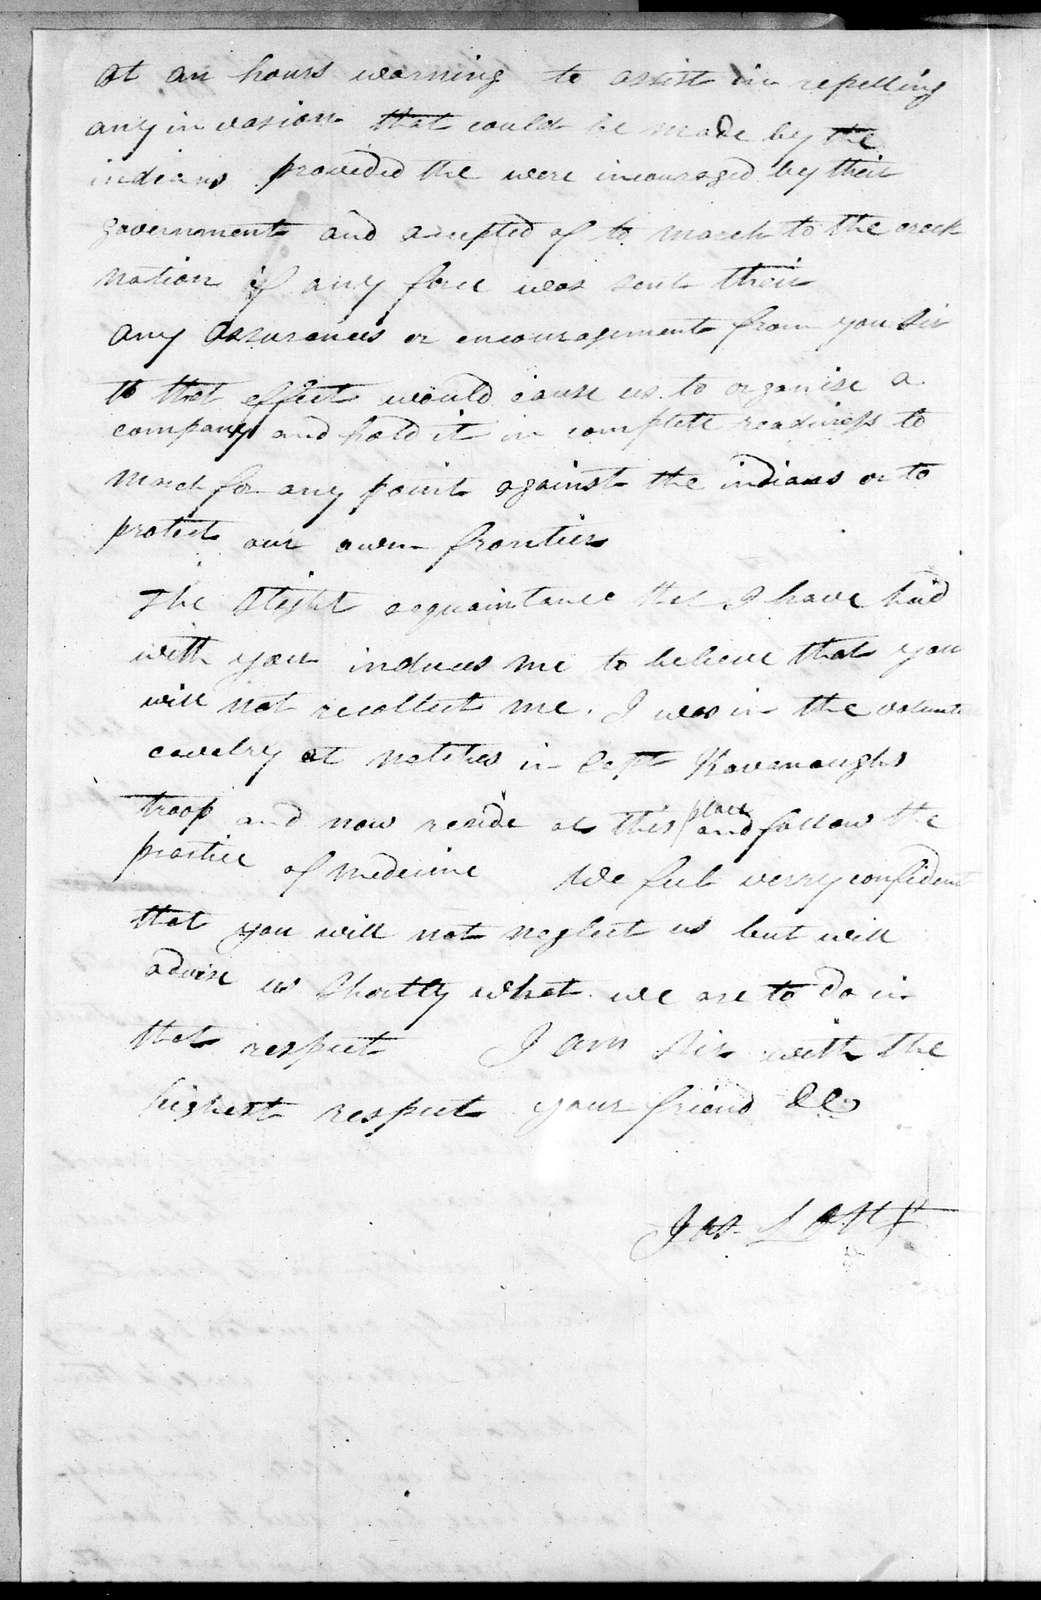 James Long to Andrew Jackson, September 8, 1813